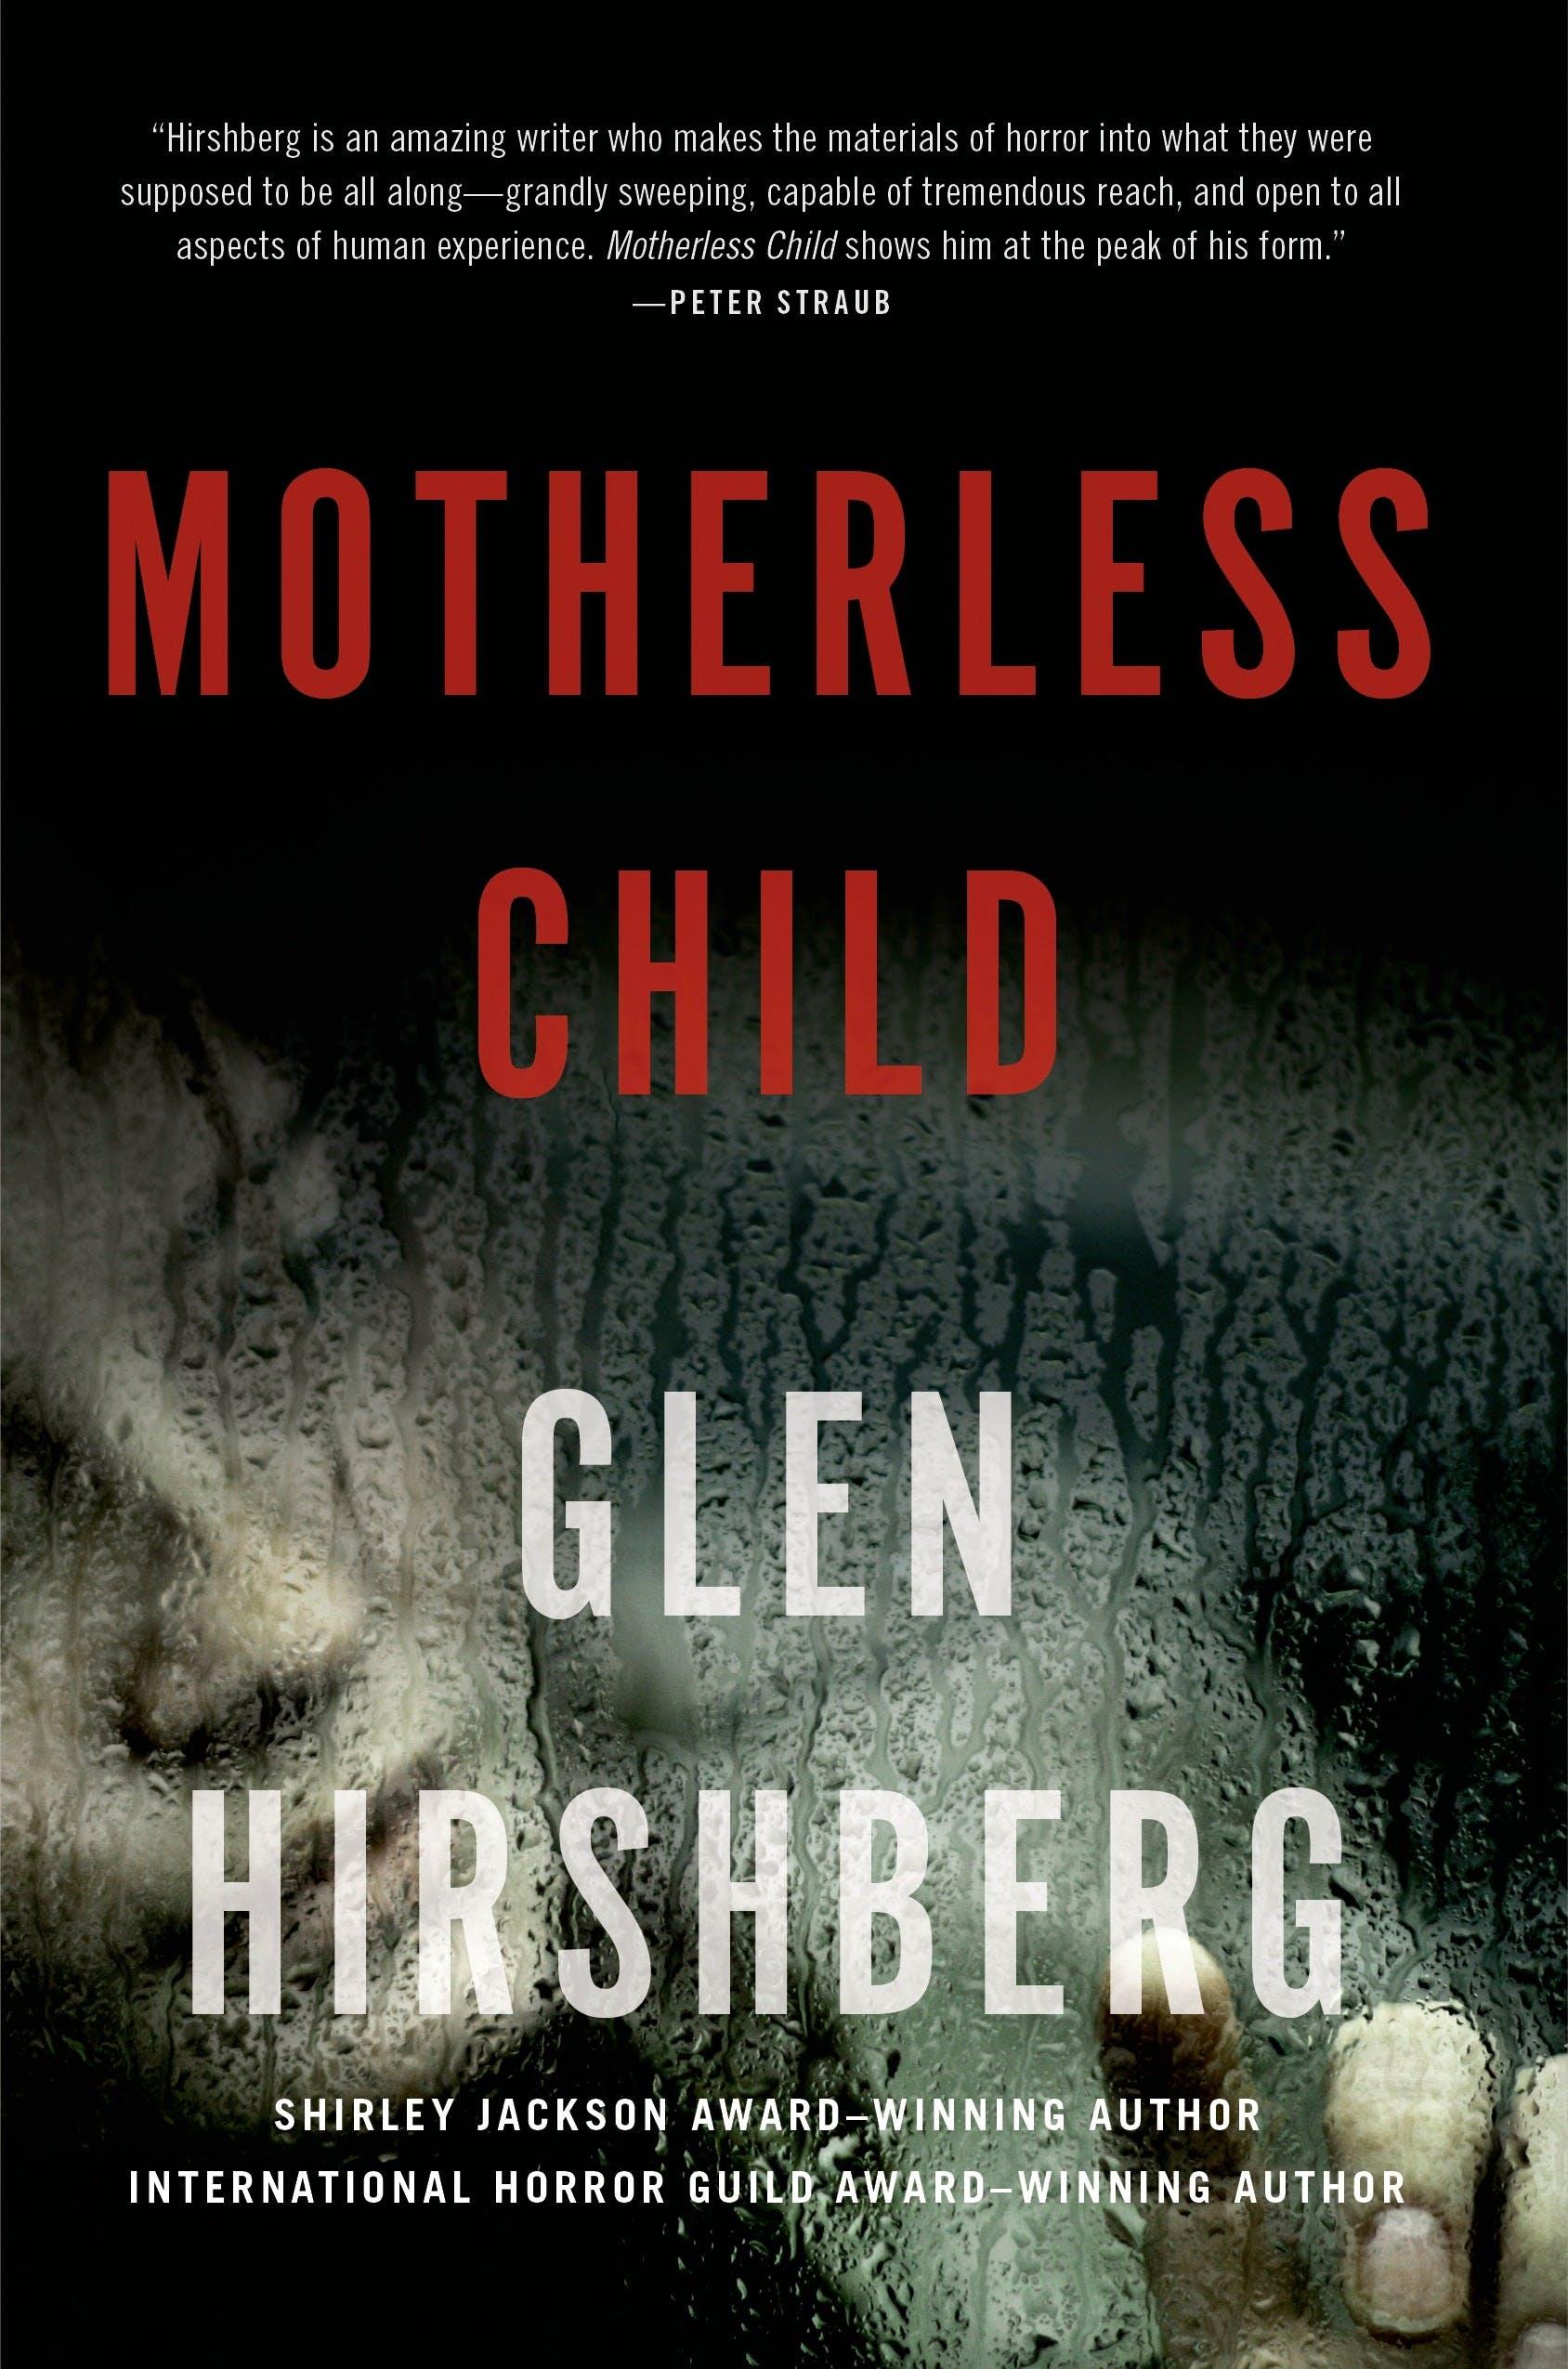 Image of Motherless Child